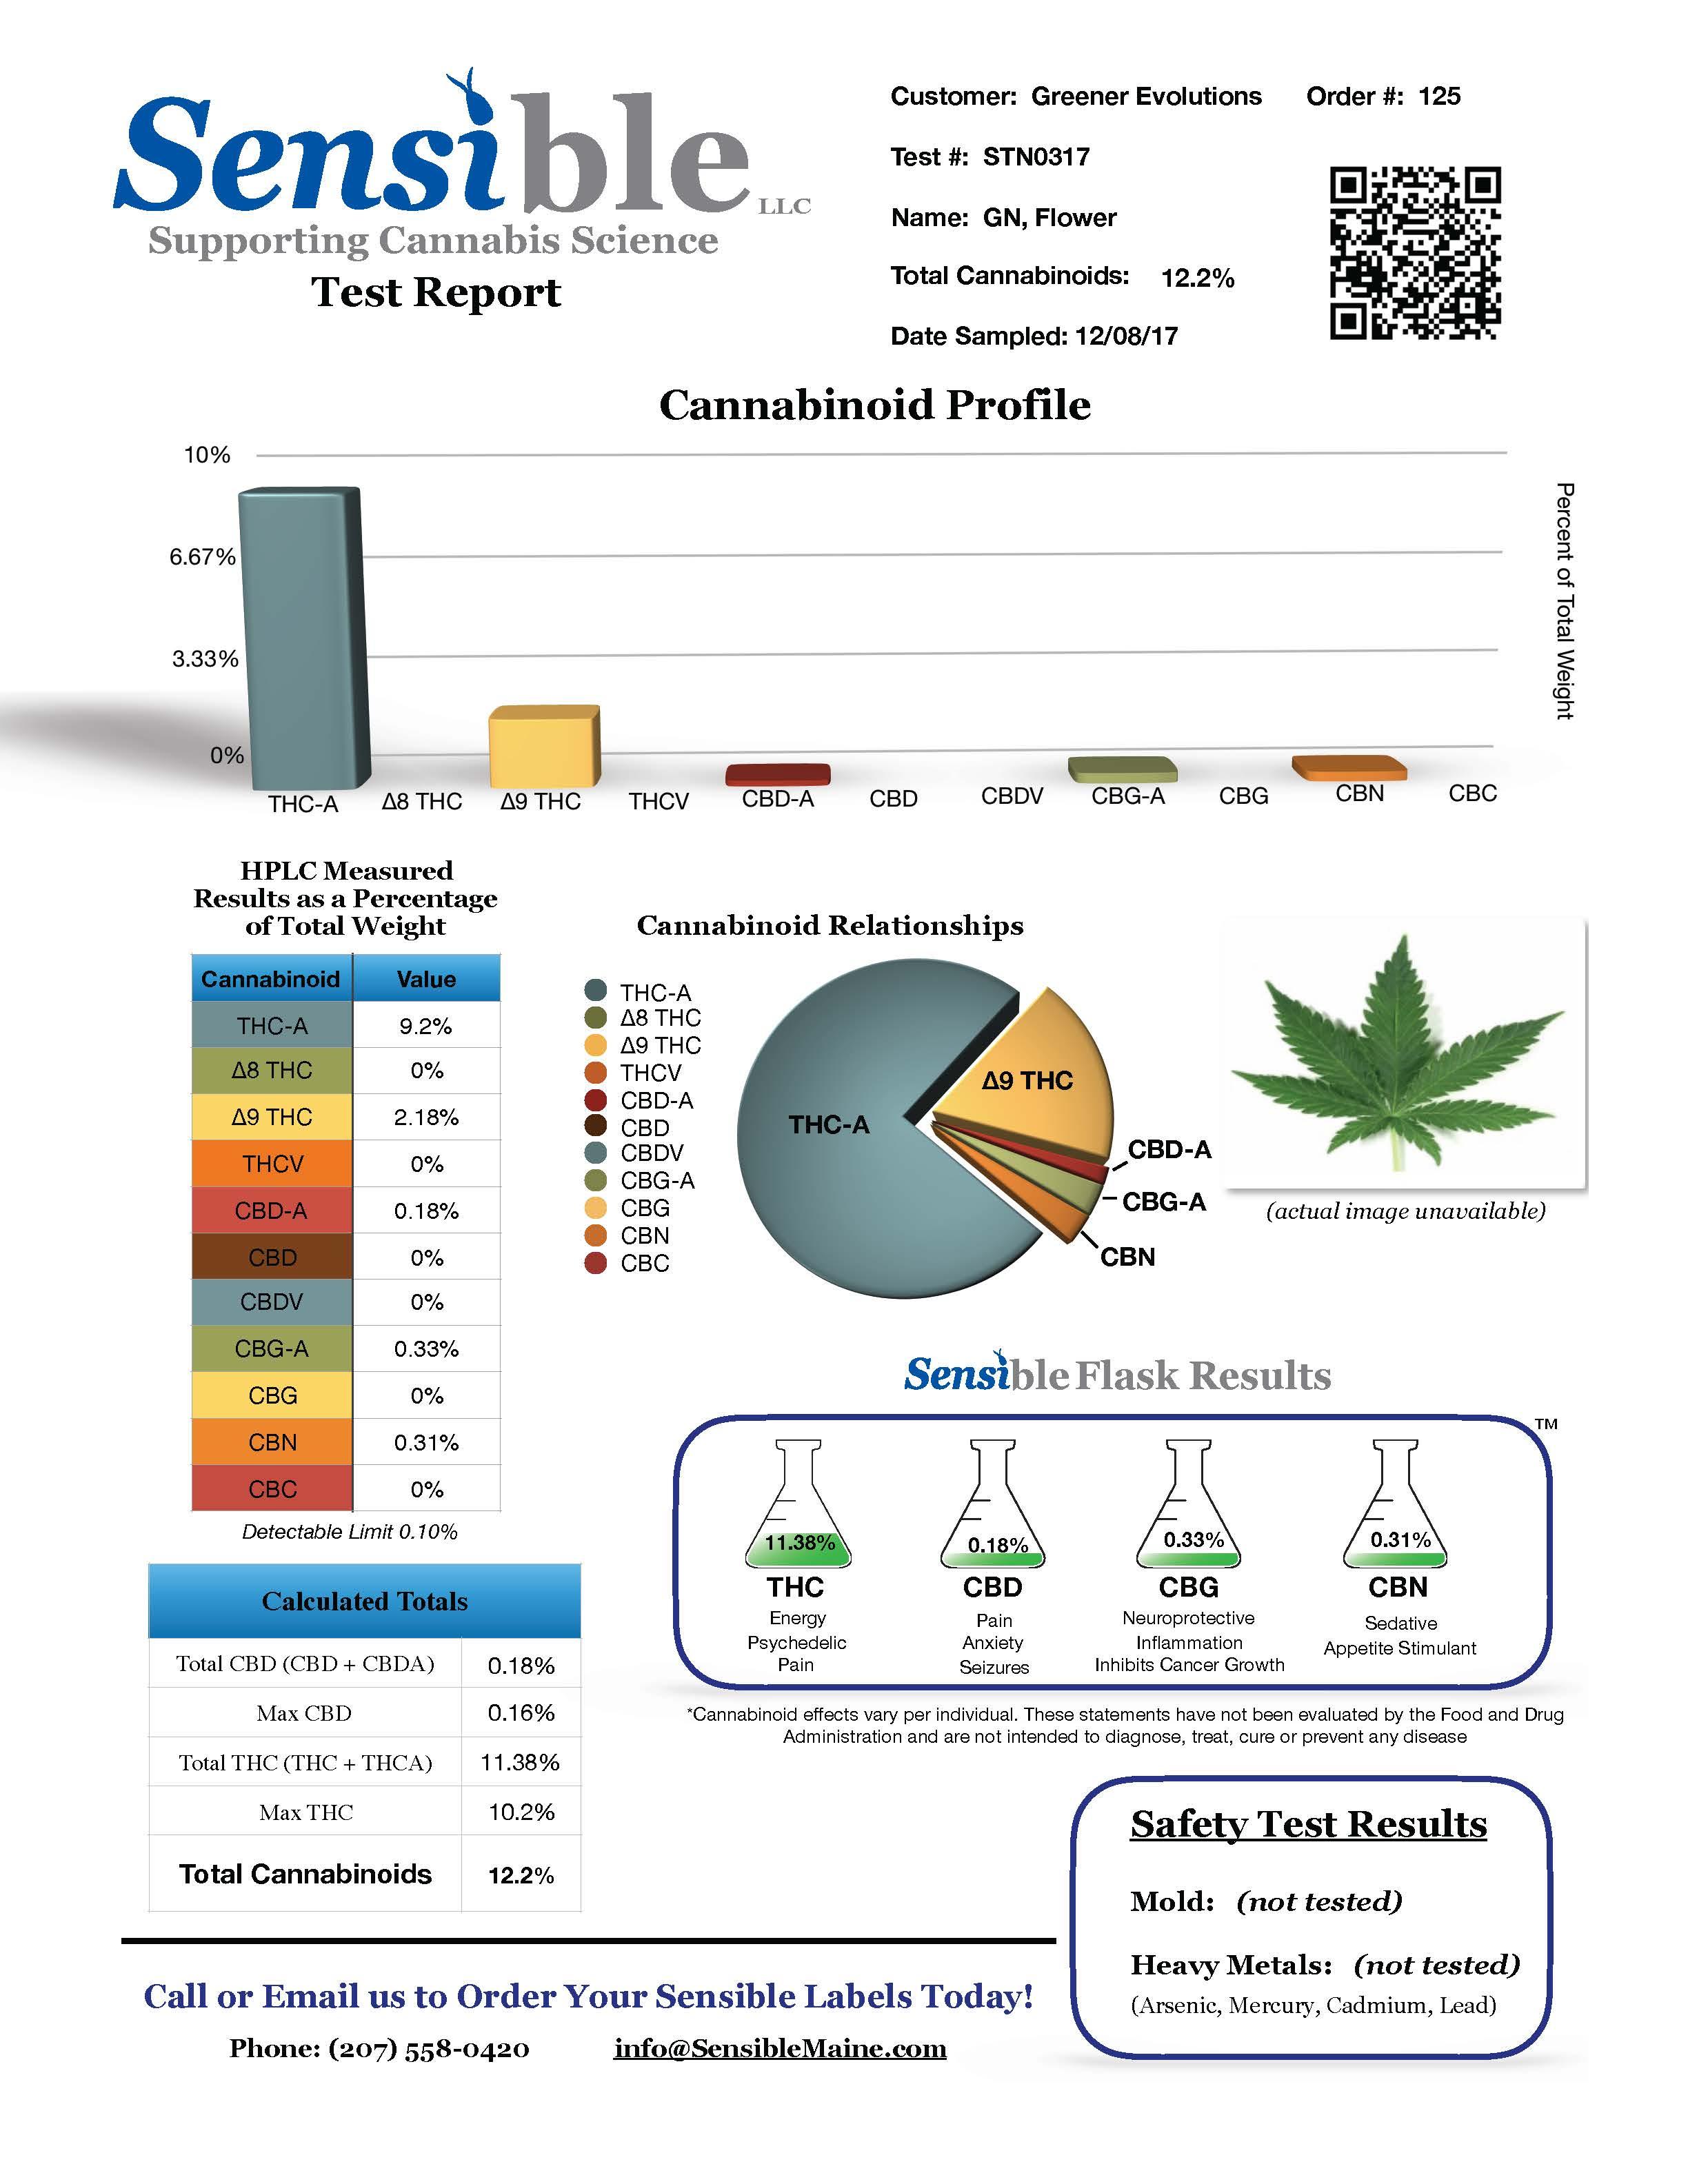 Test Report stn0317.jpg